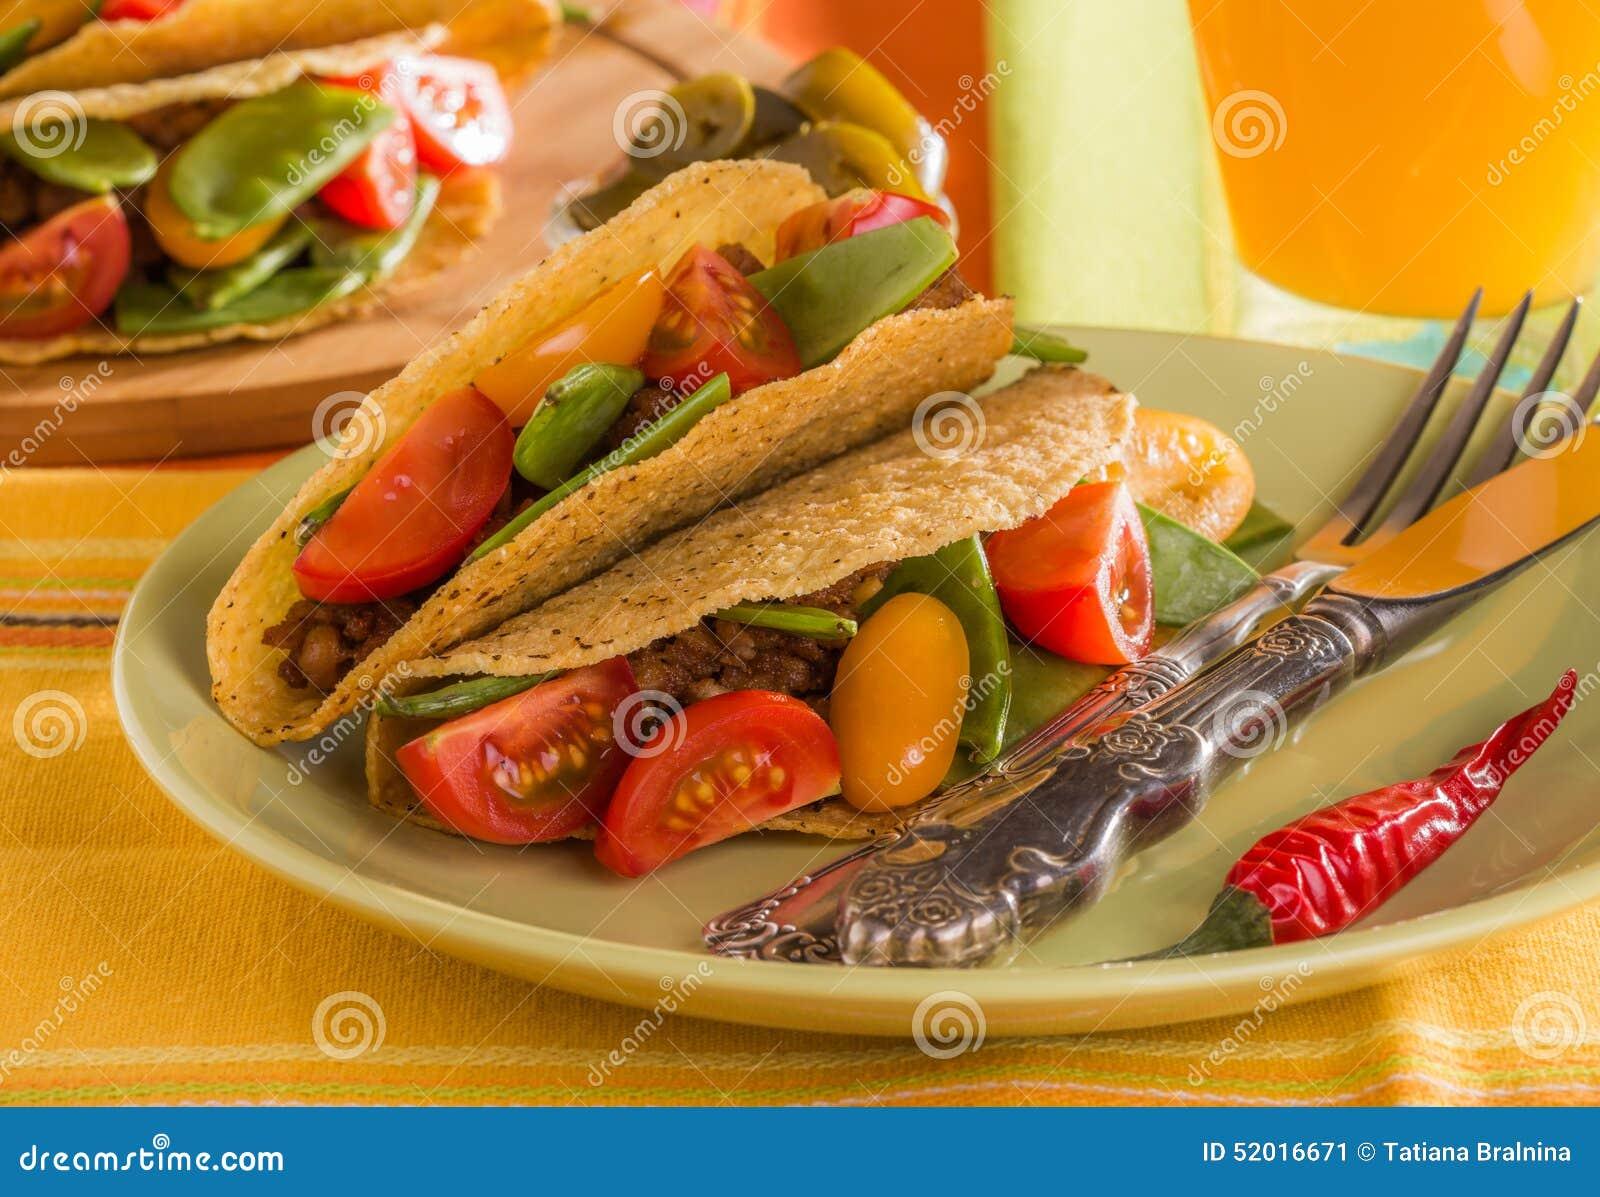 Delicious Mexican Tacos Stock Photo - Image: 52016671